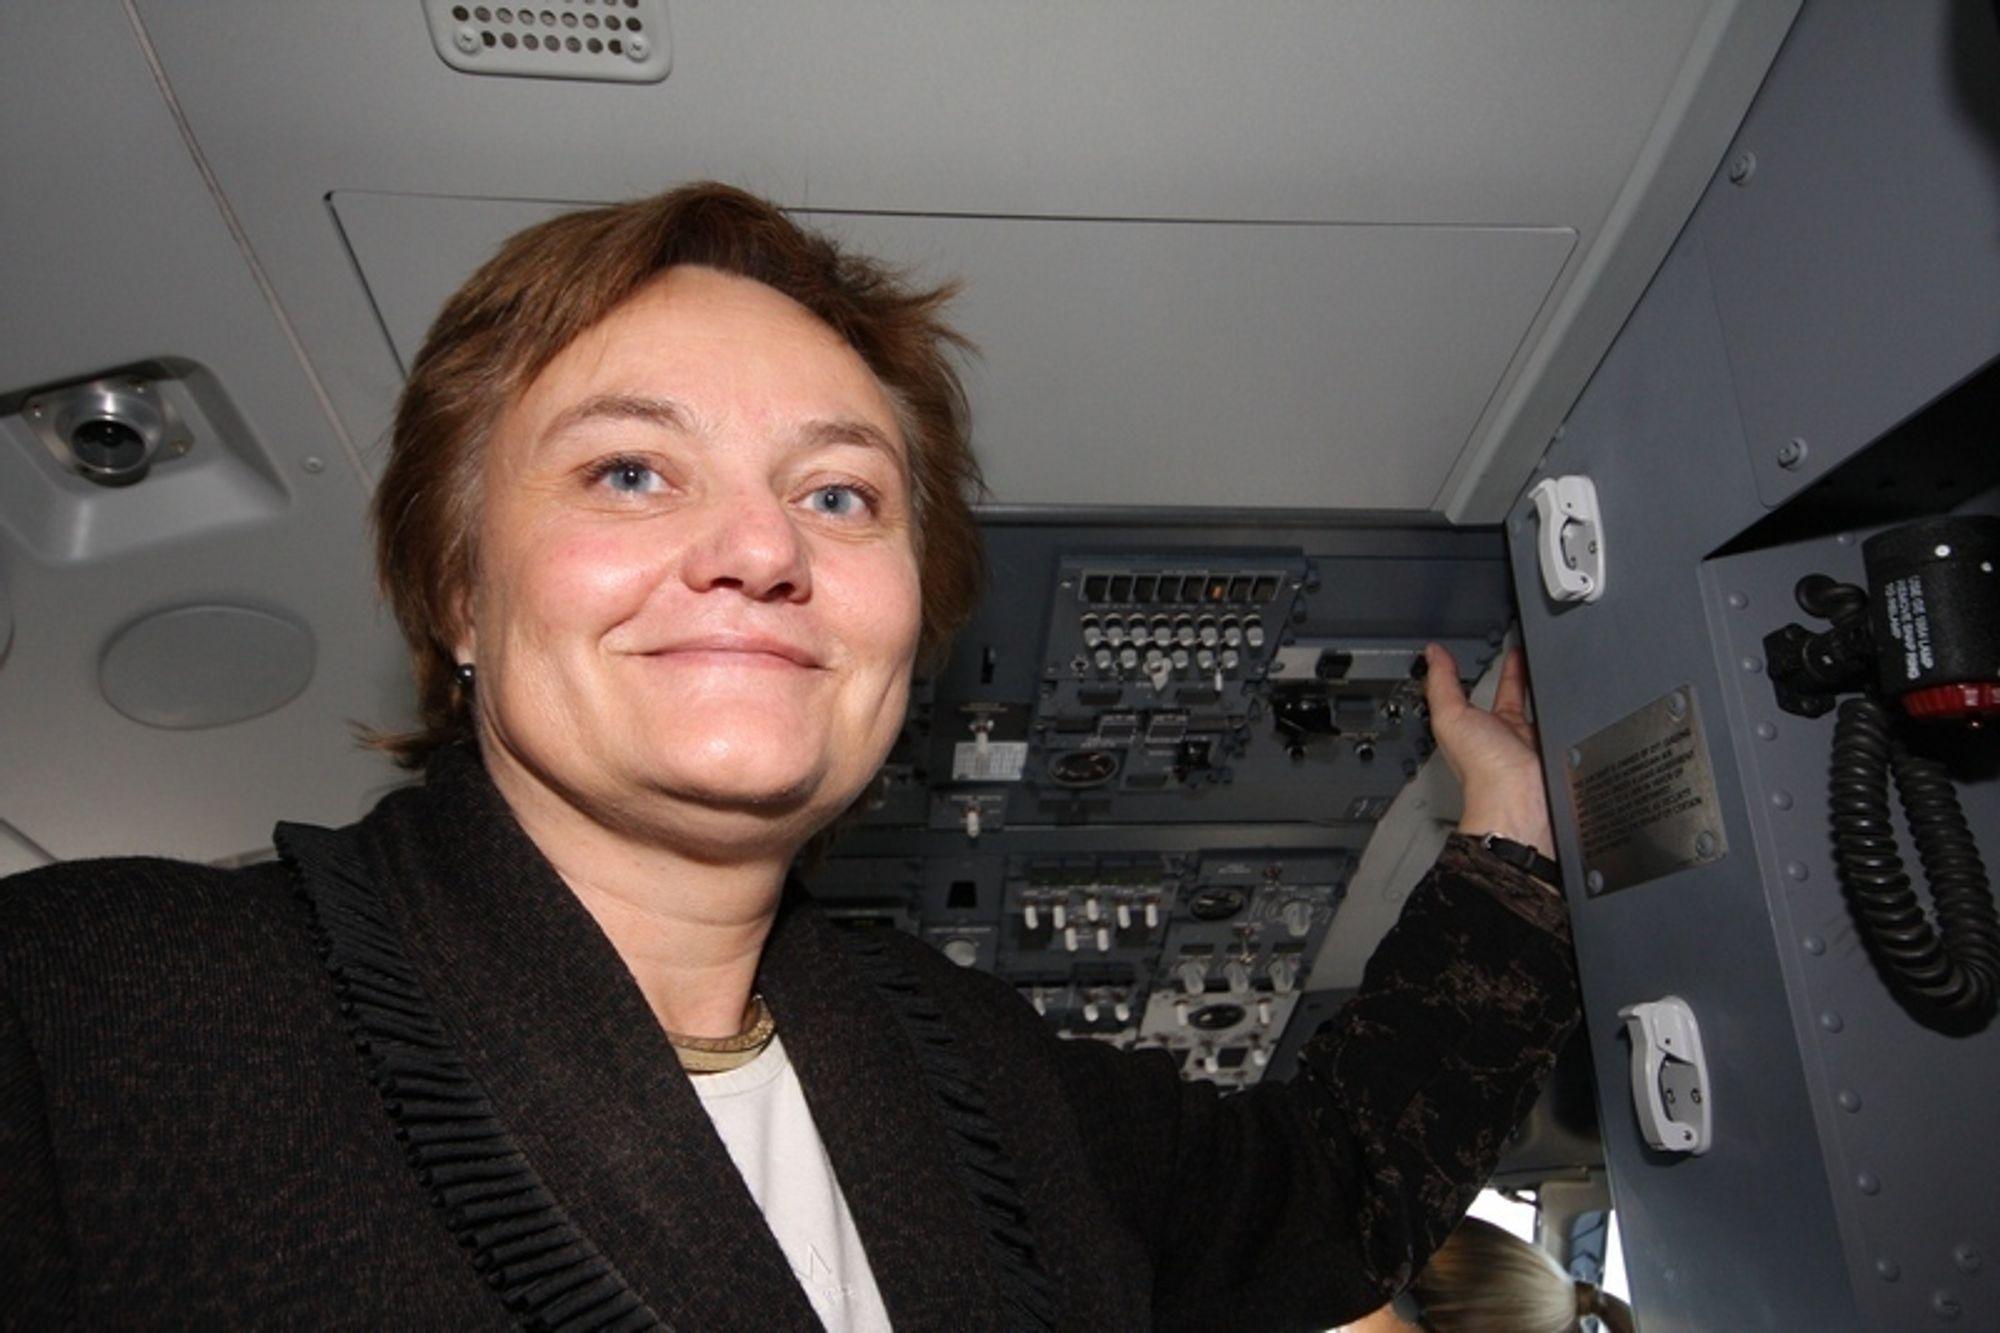 PÅ LUFTA: It-minister Rigmor Aasrud kunne starte Norwegians bredbånd i lufta fredag formiddag.